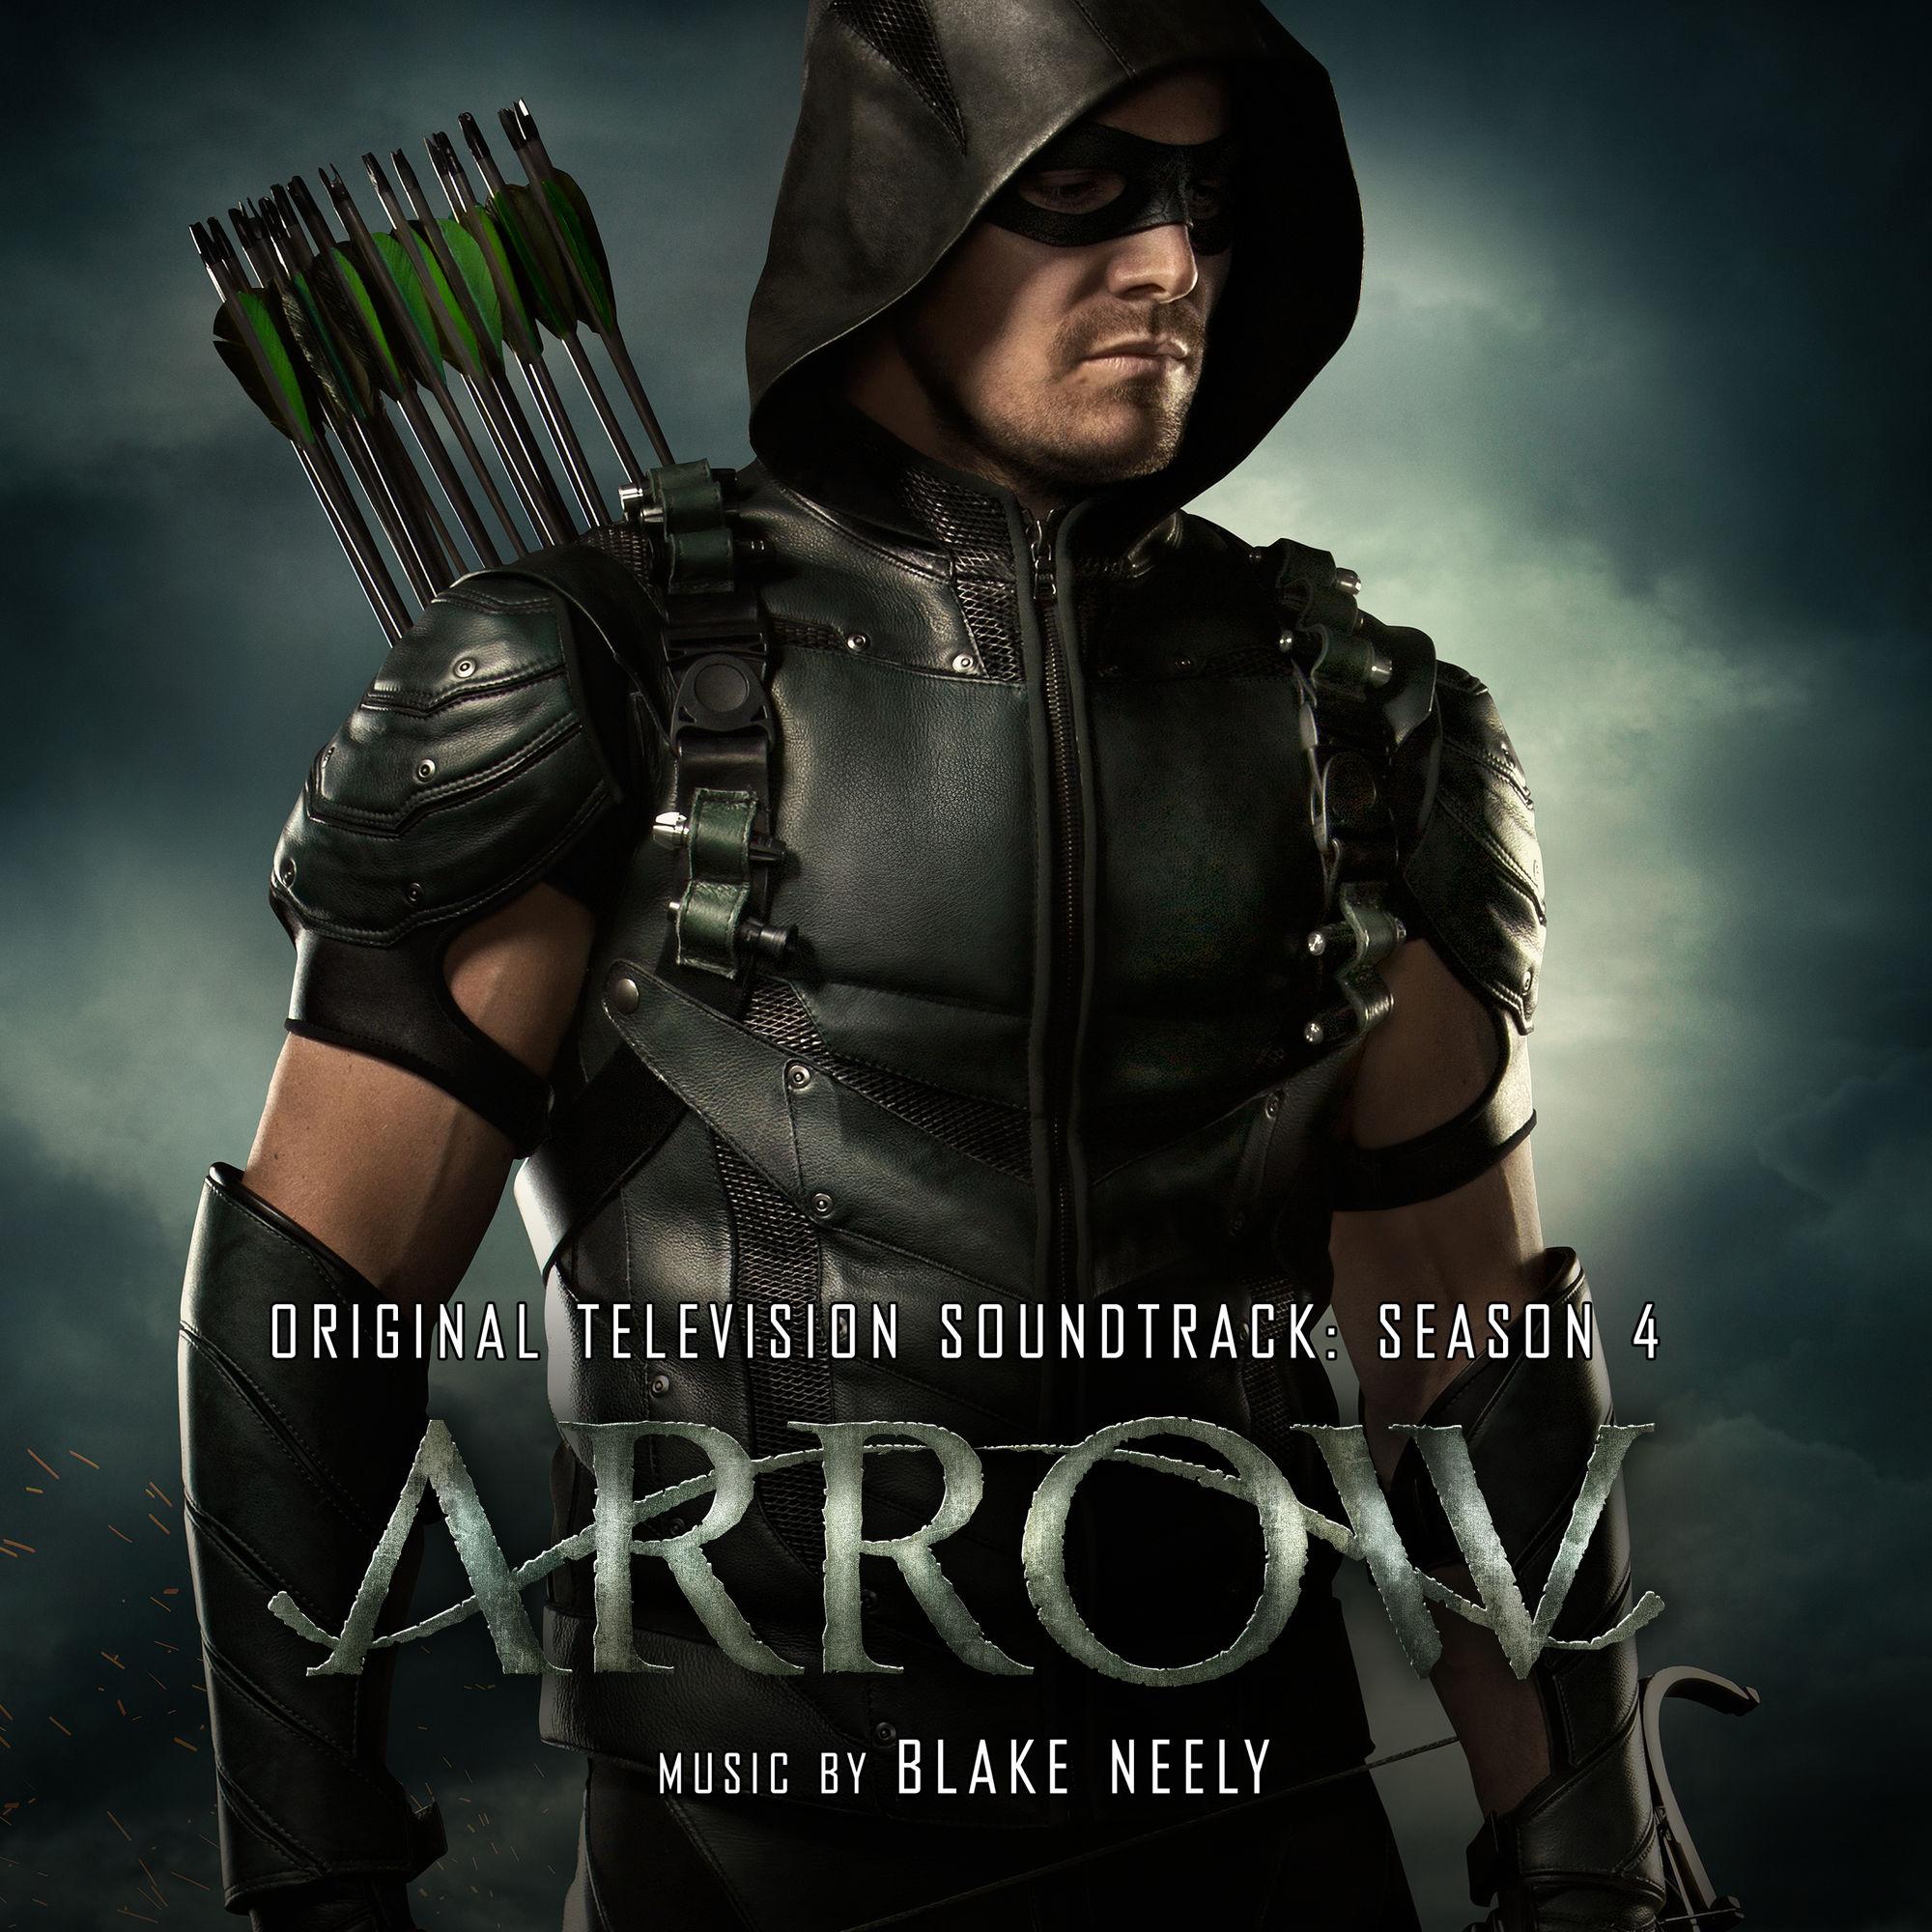 Arrow - Original Television Soundtrack Season 4.png